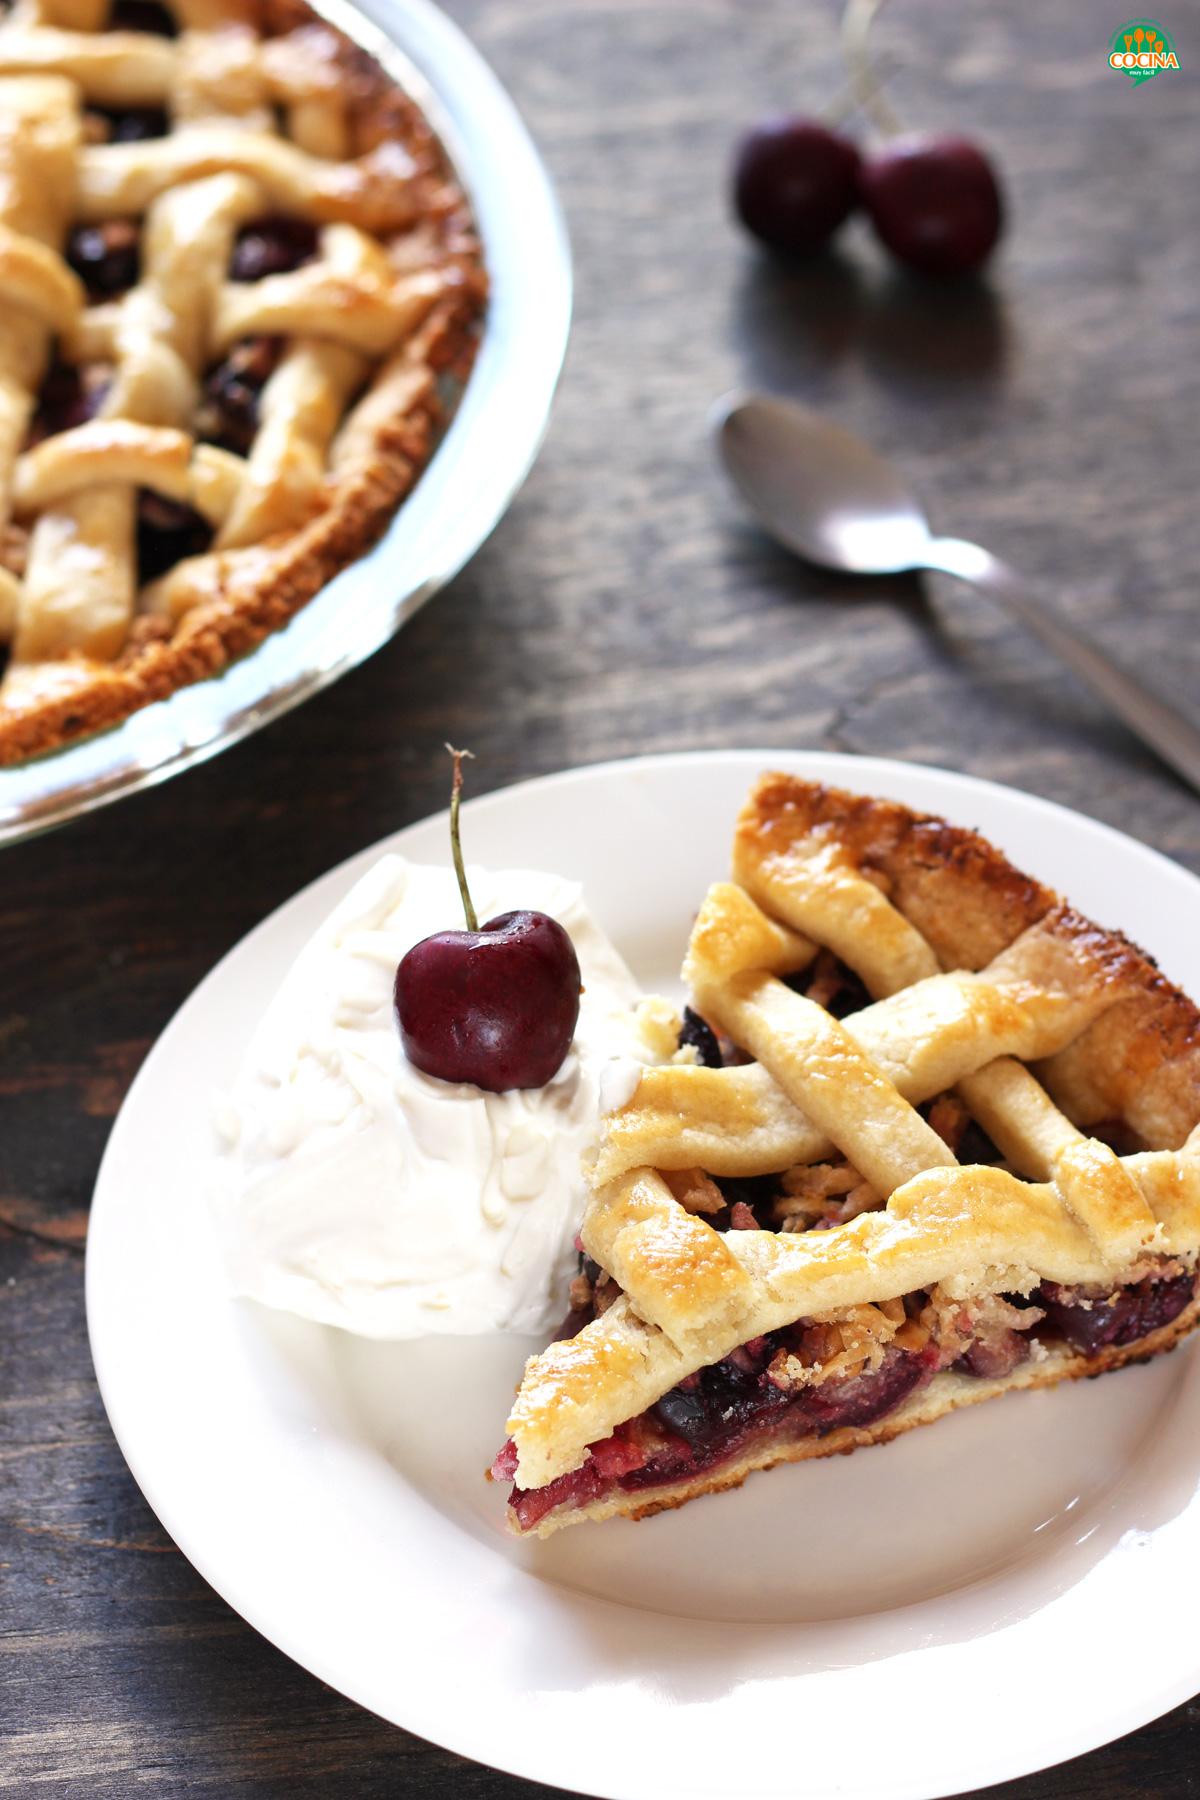 Tarta de cerezas o Cherry Pie. Receta   cocinamuyfacil.com